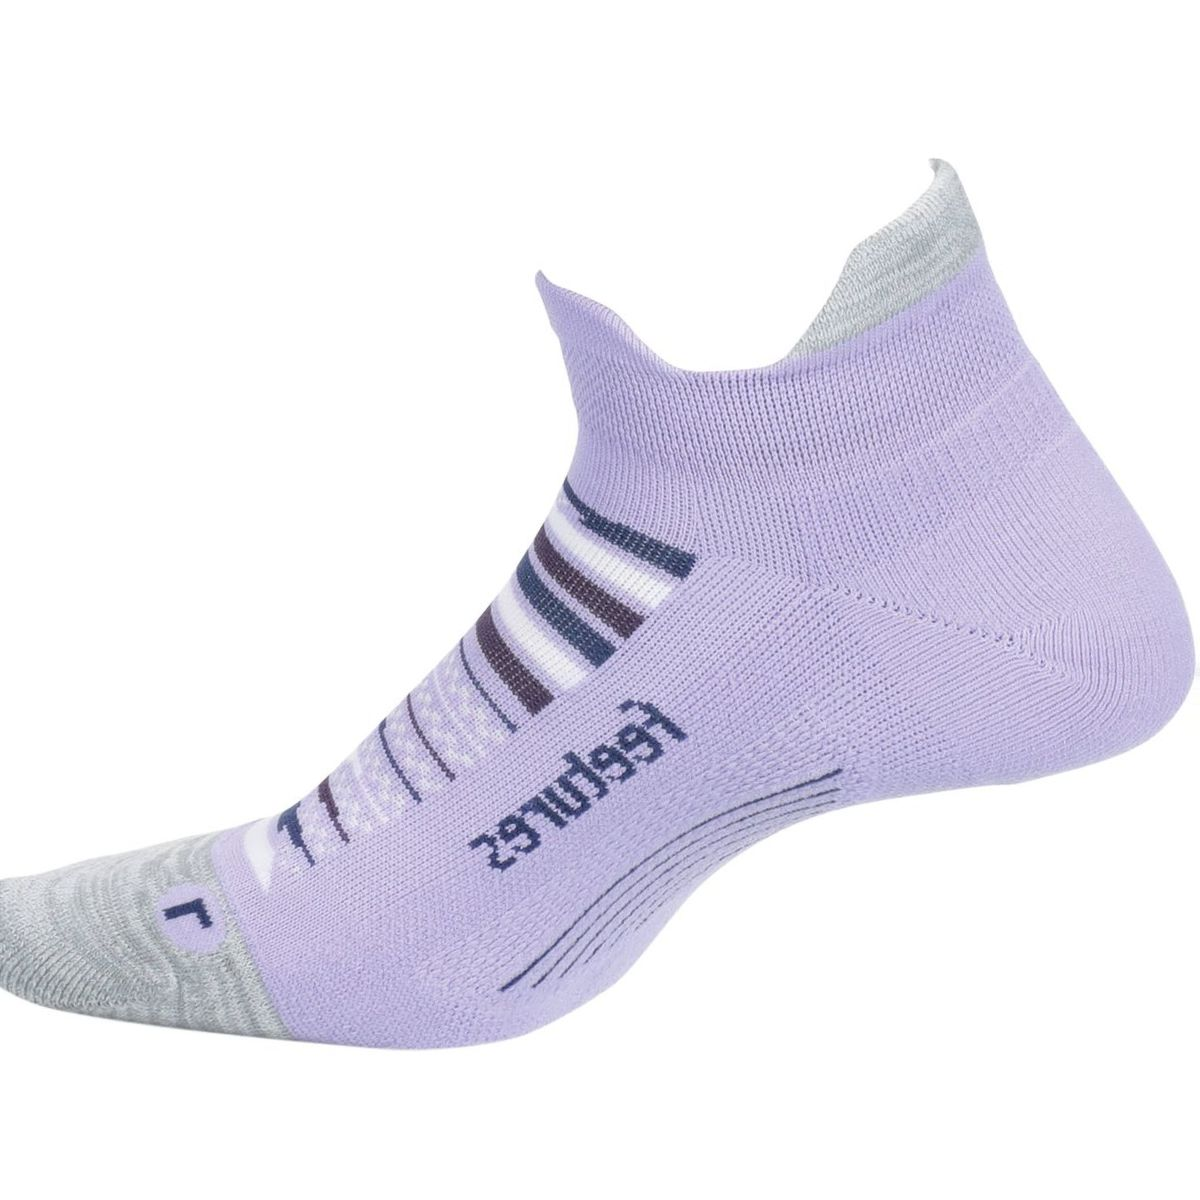 Feetures! Elite Light Cushion No Show Tab Sock - Women's